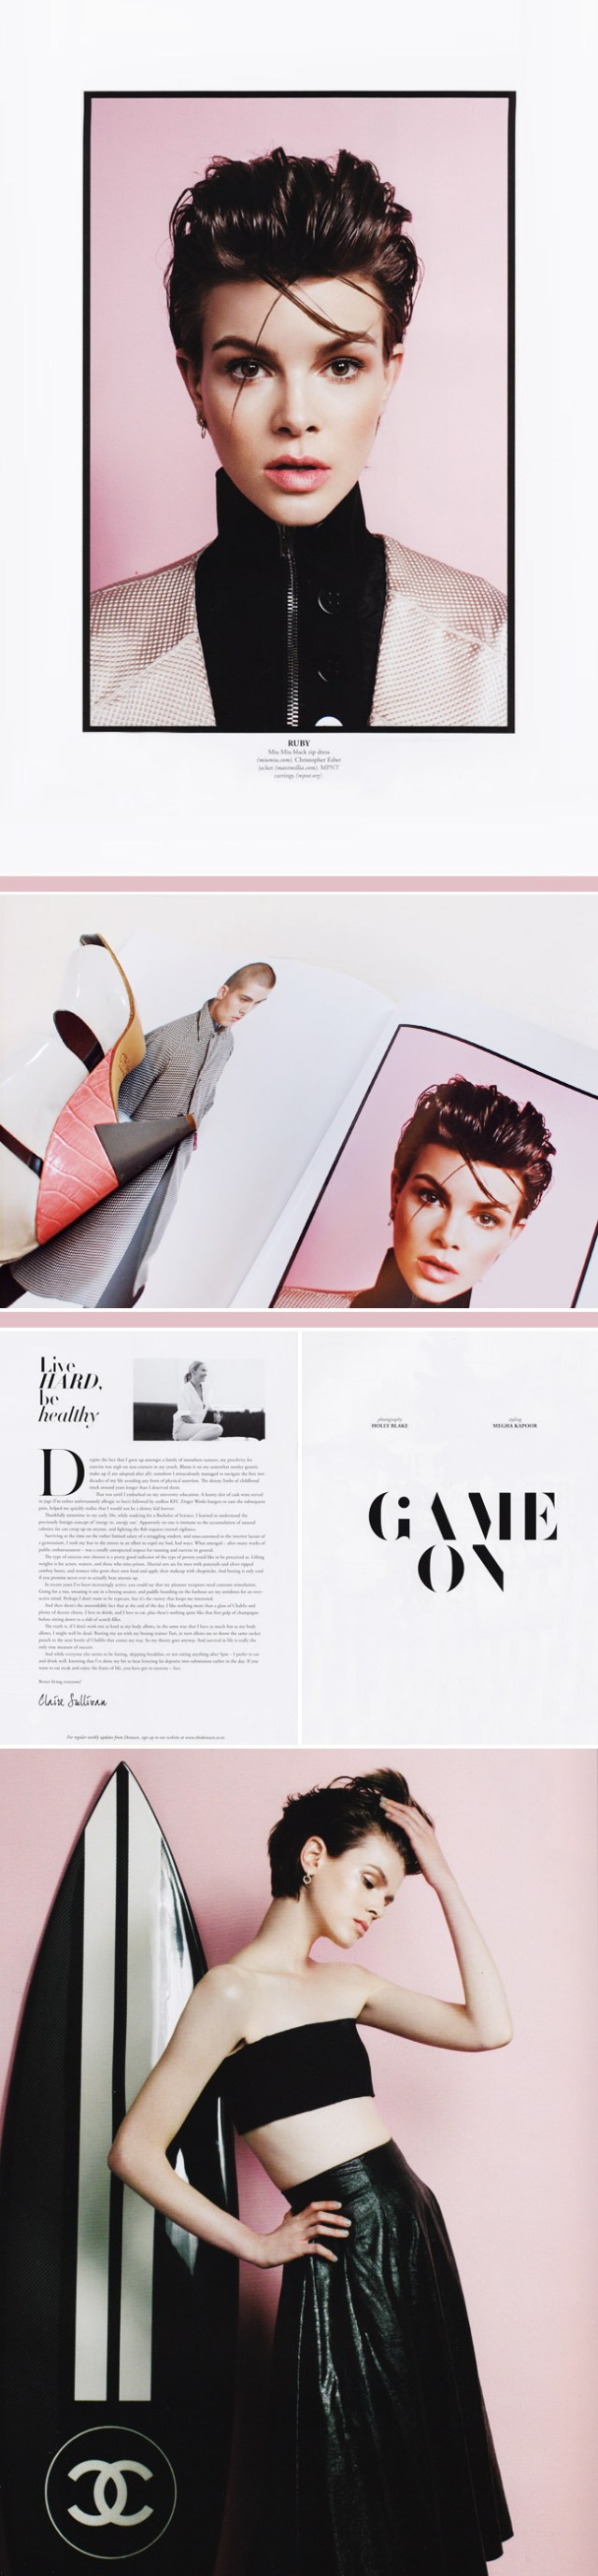 Nubby Twiglet | Denizen Magazine